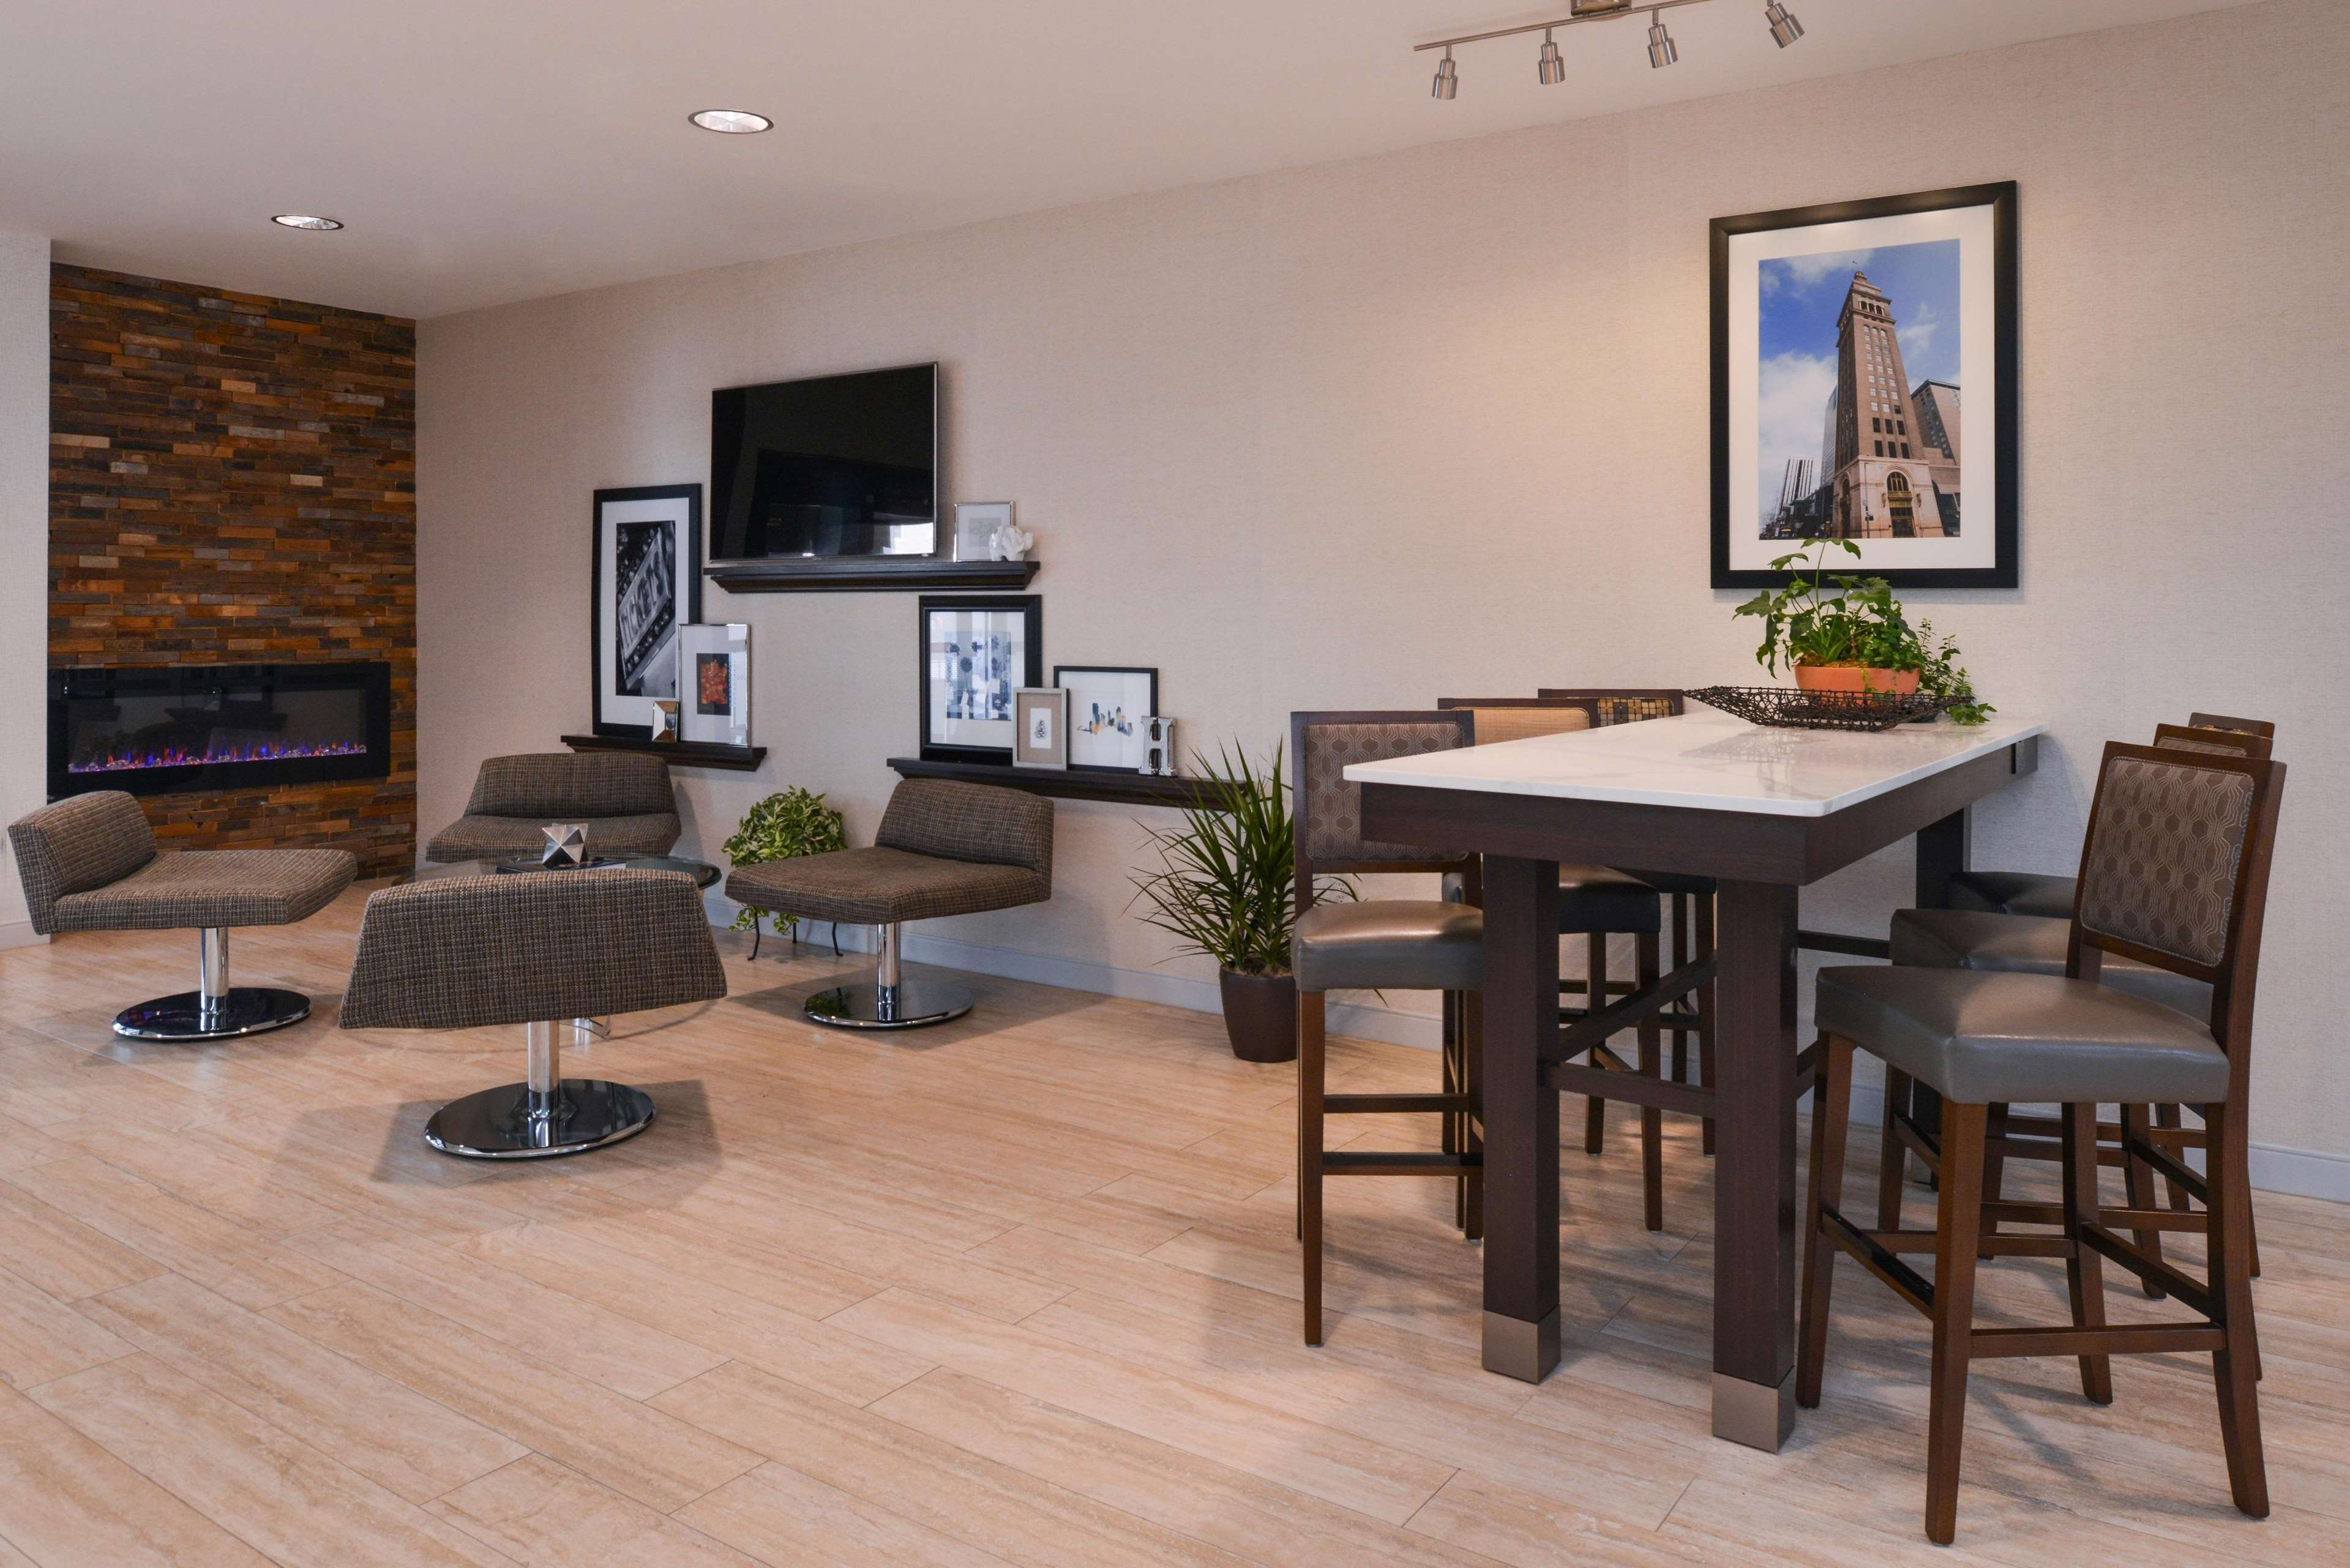 Hampton Inn & Suites Denver-Speer Boulevard image 44